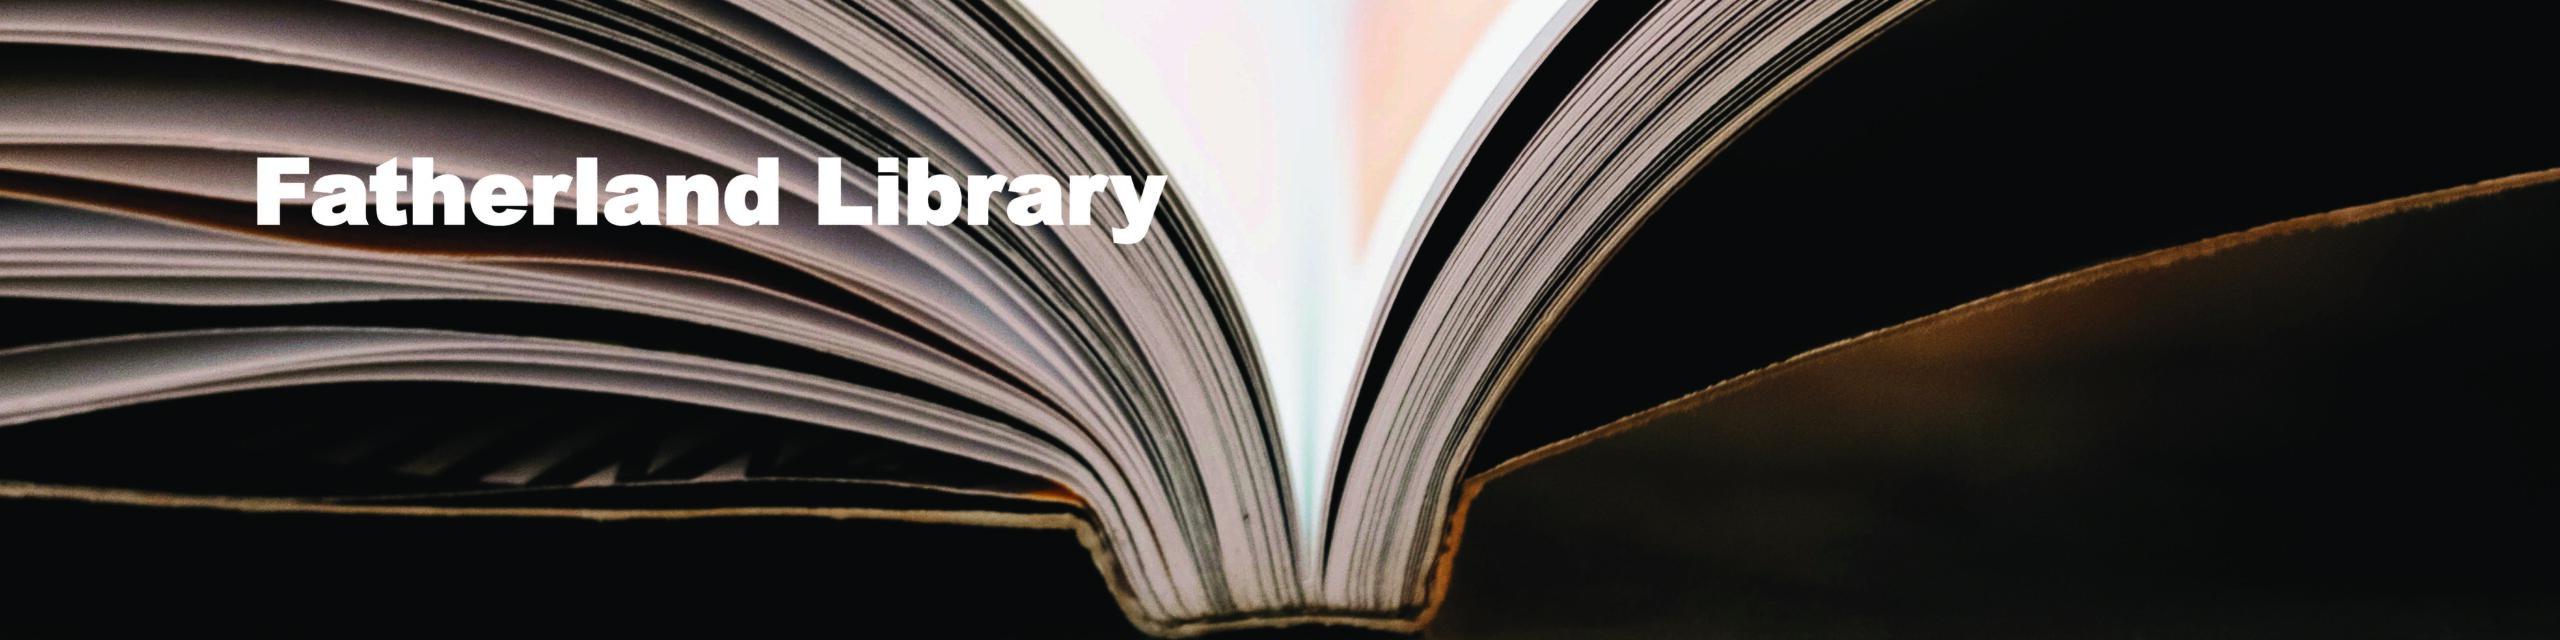 Fatherland Library-books04